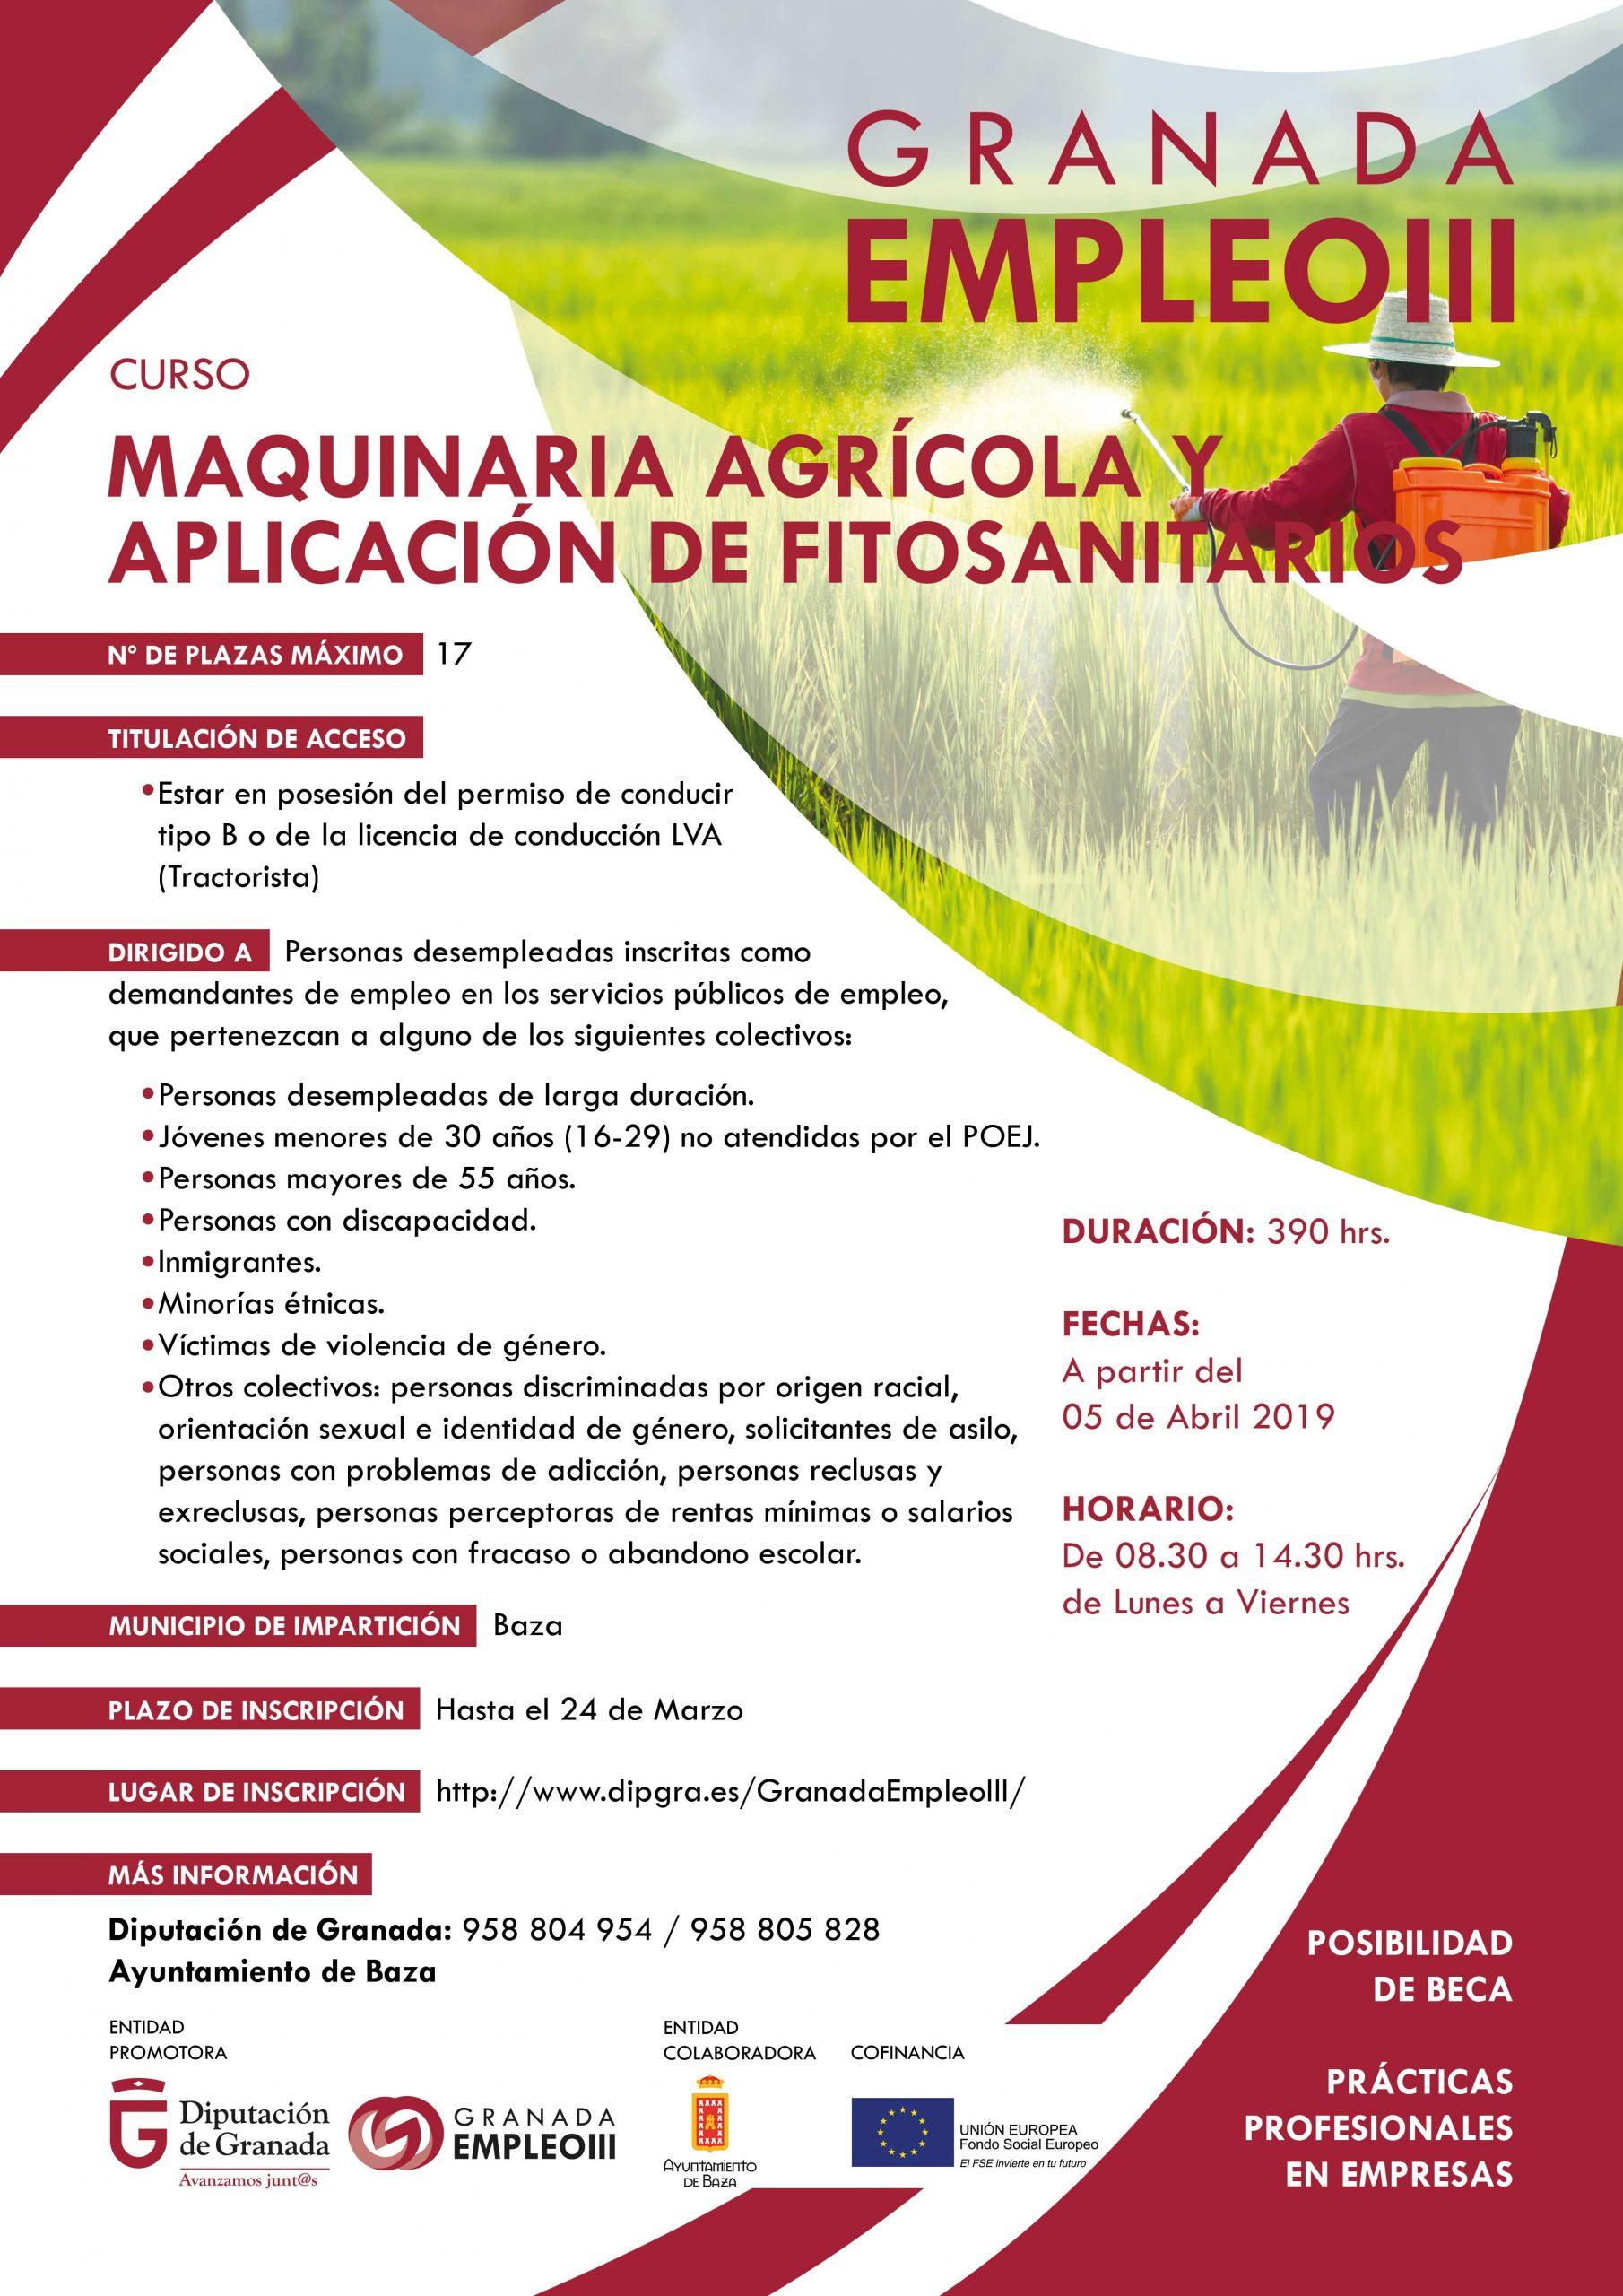 cartel maquinaria agricola baza granada empleoIII